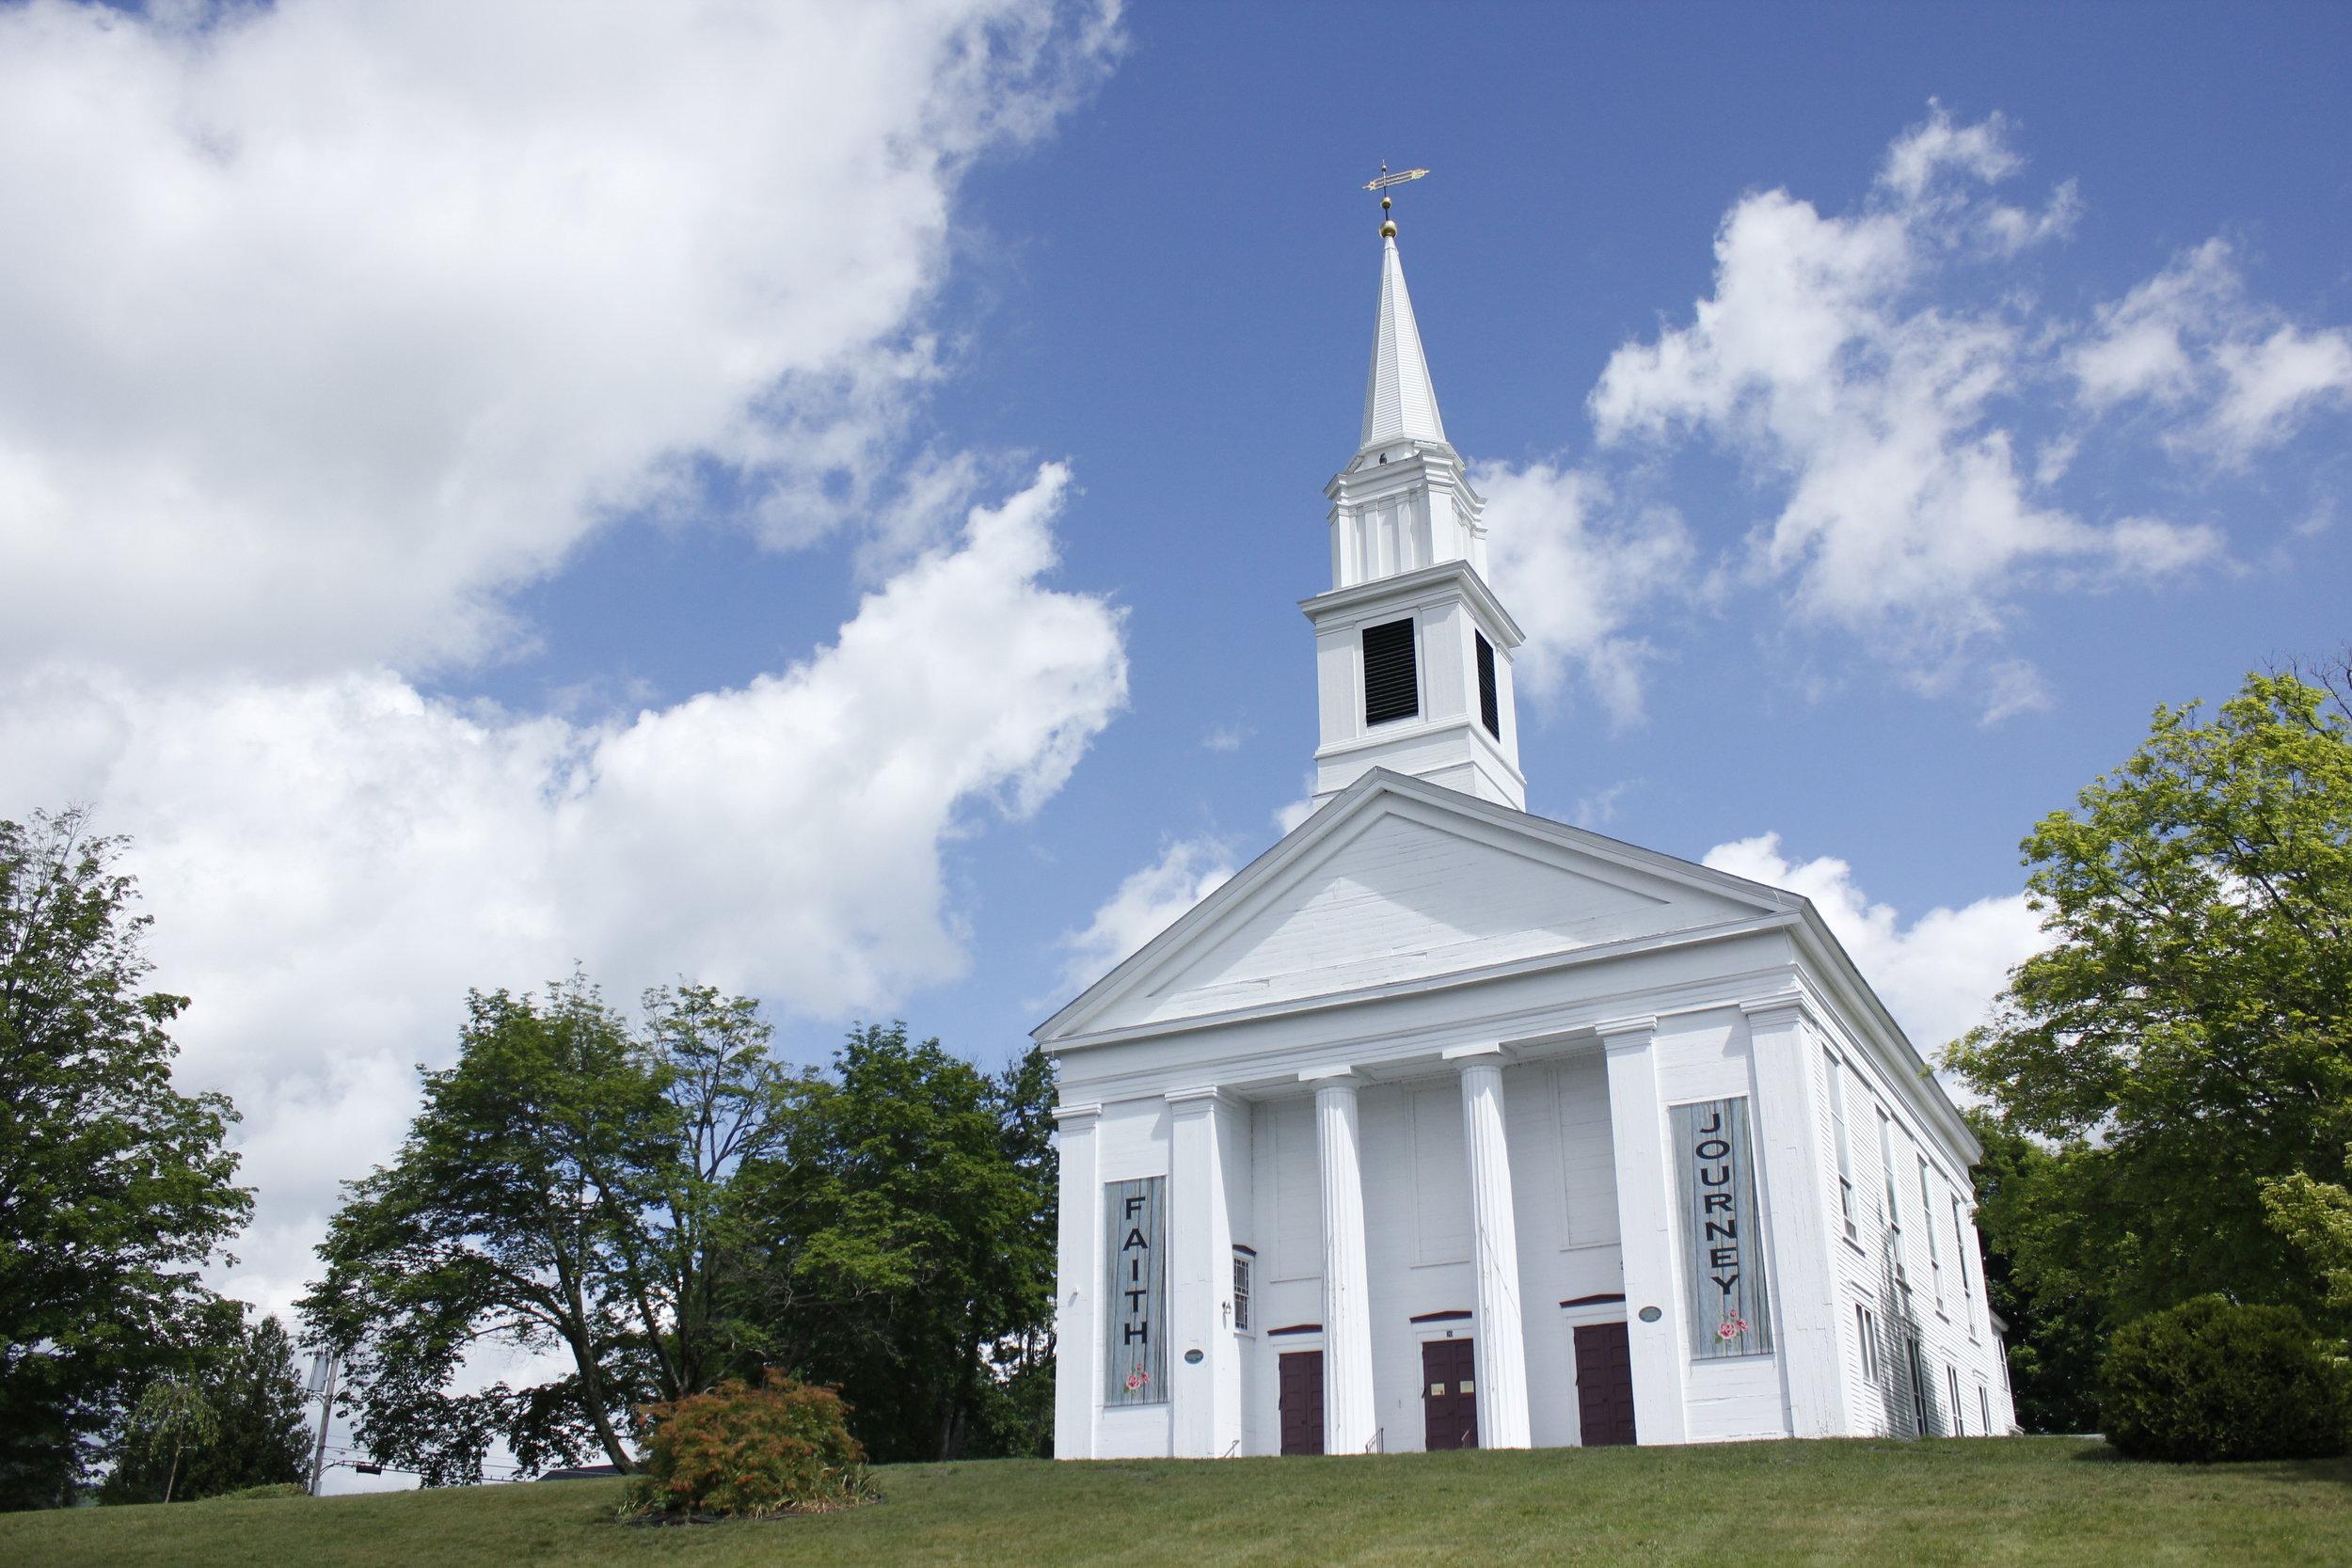 First Congregational Church UCC 20 MAIN STREET BRIMFIELD, MASSACHUSETTS PHONE: (413)245-7162     PASTOR DAWN ADAMS  CHRIS BOLTE, ADMINISTRATIVE ASSISTANT  JENNIE SIMMONS, CHOIR DIRECTOR  MAILING ADDRESS: PO BOX 203 BRIMFIELD, MA 01010-0203  www.brimfielducc.org